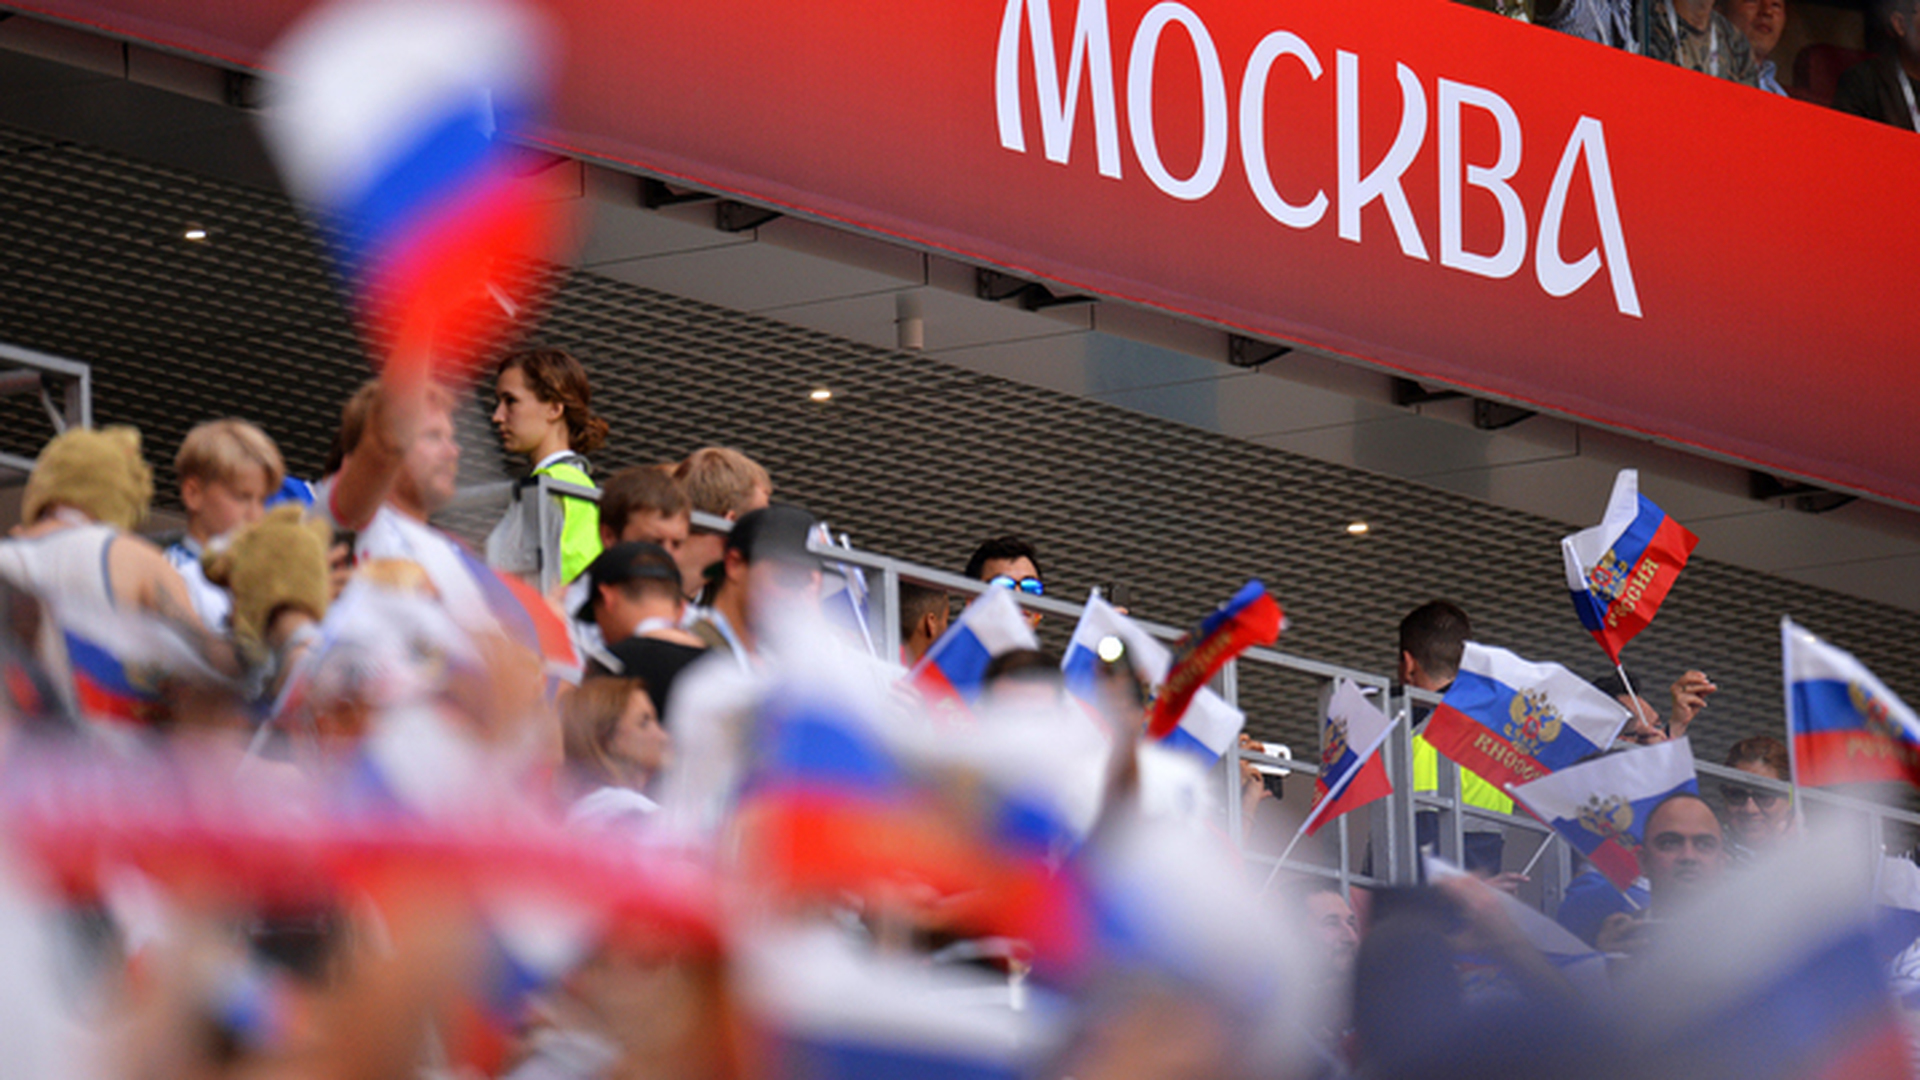 Футбол на Центральном рынке: фанаты празднуют успех